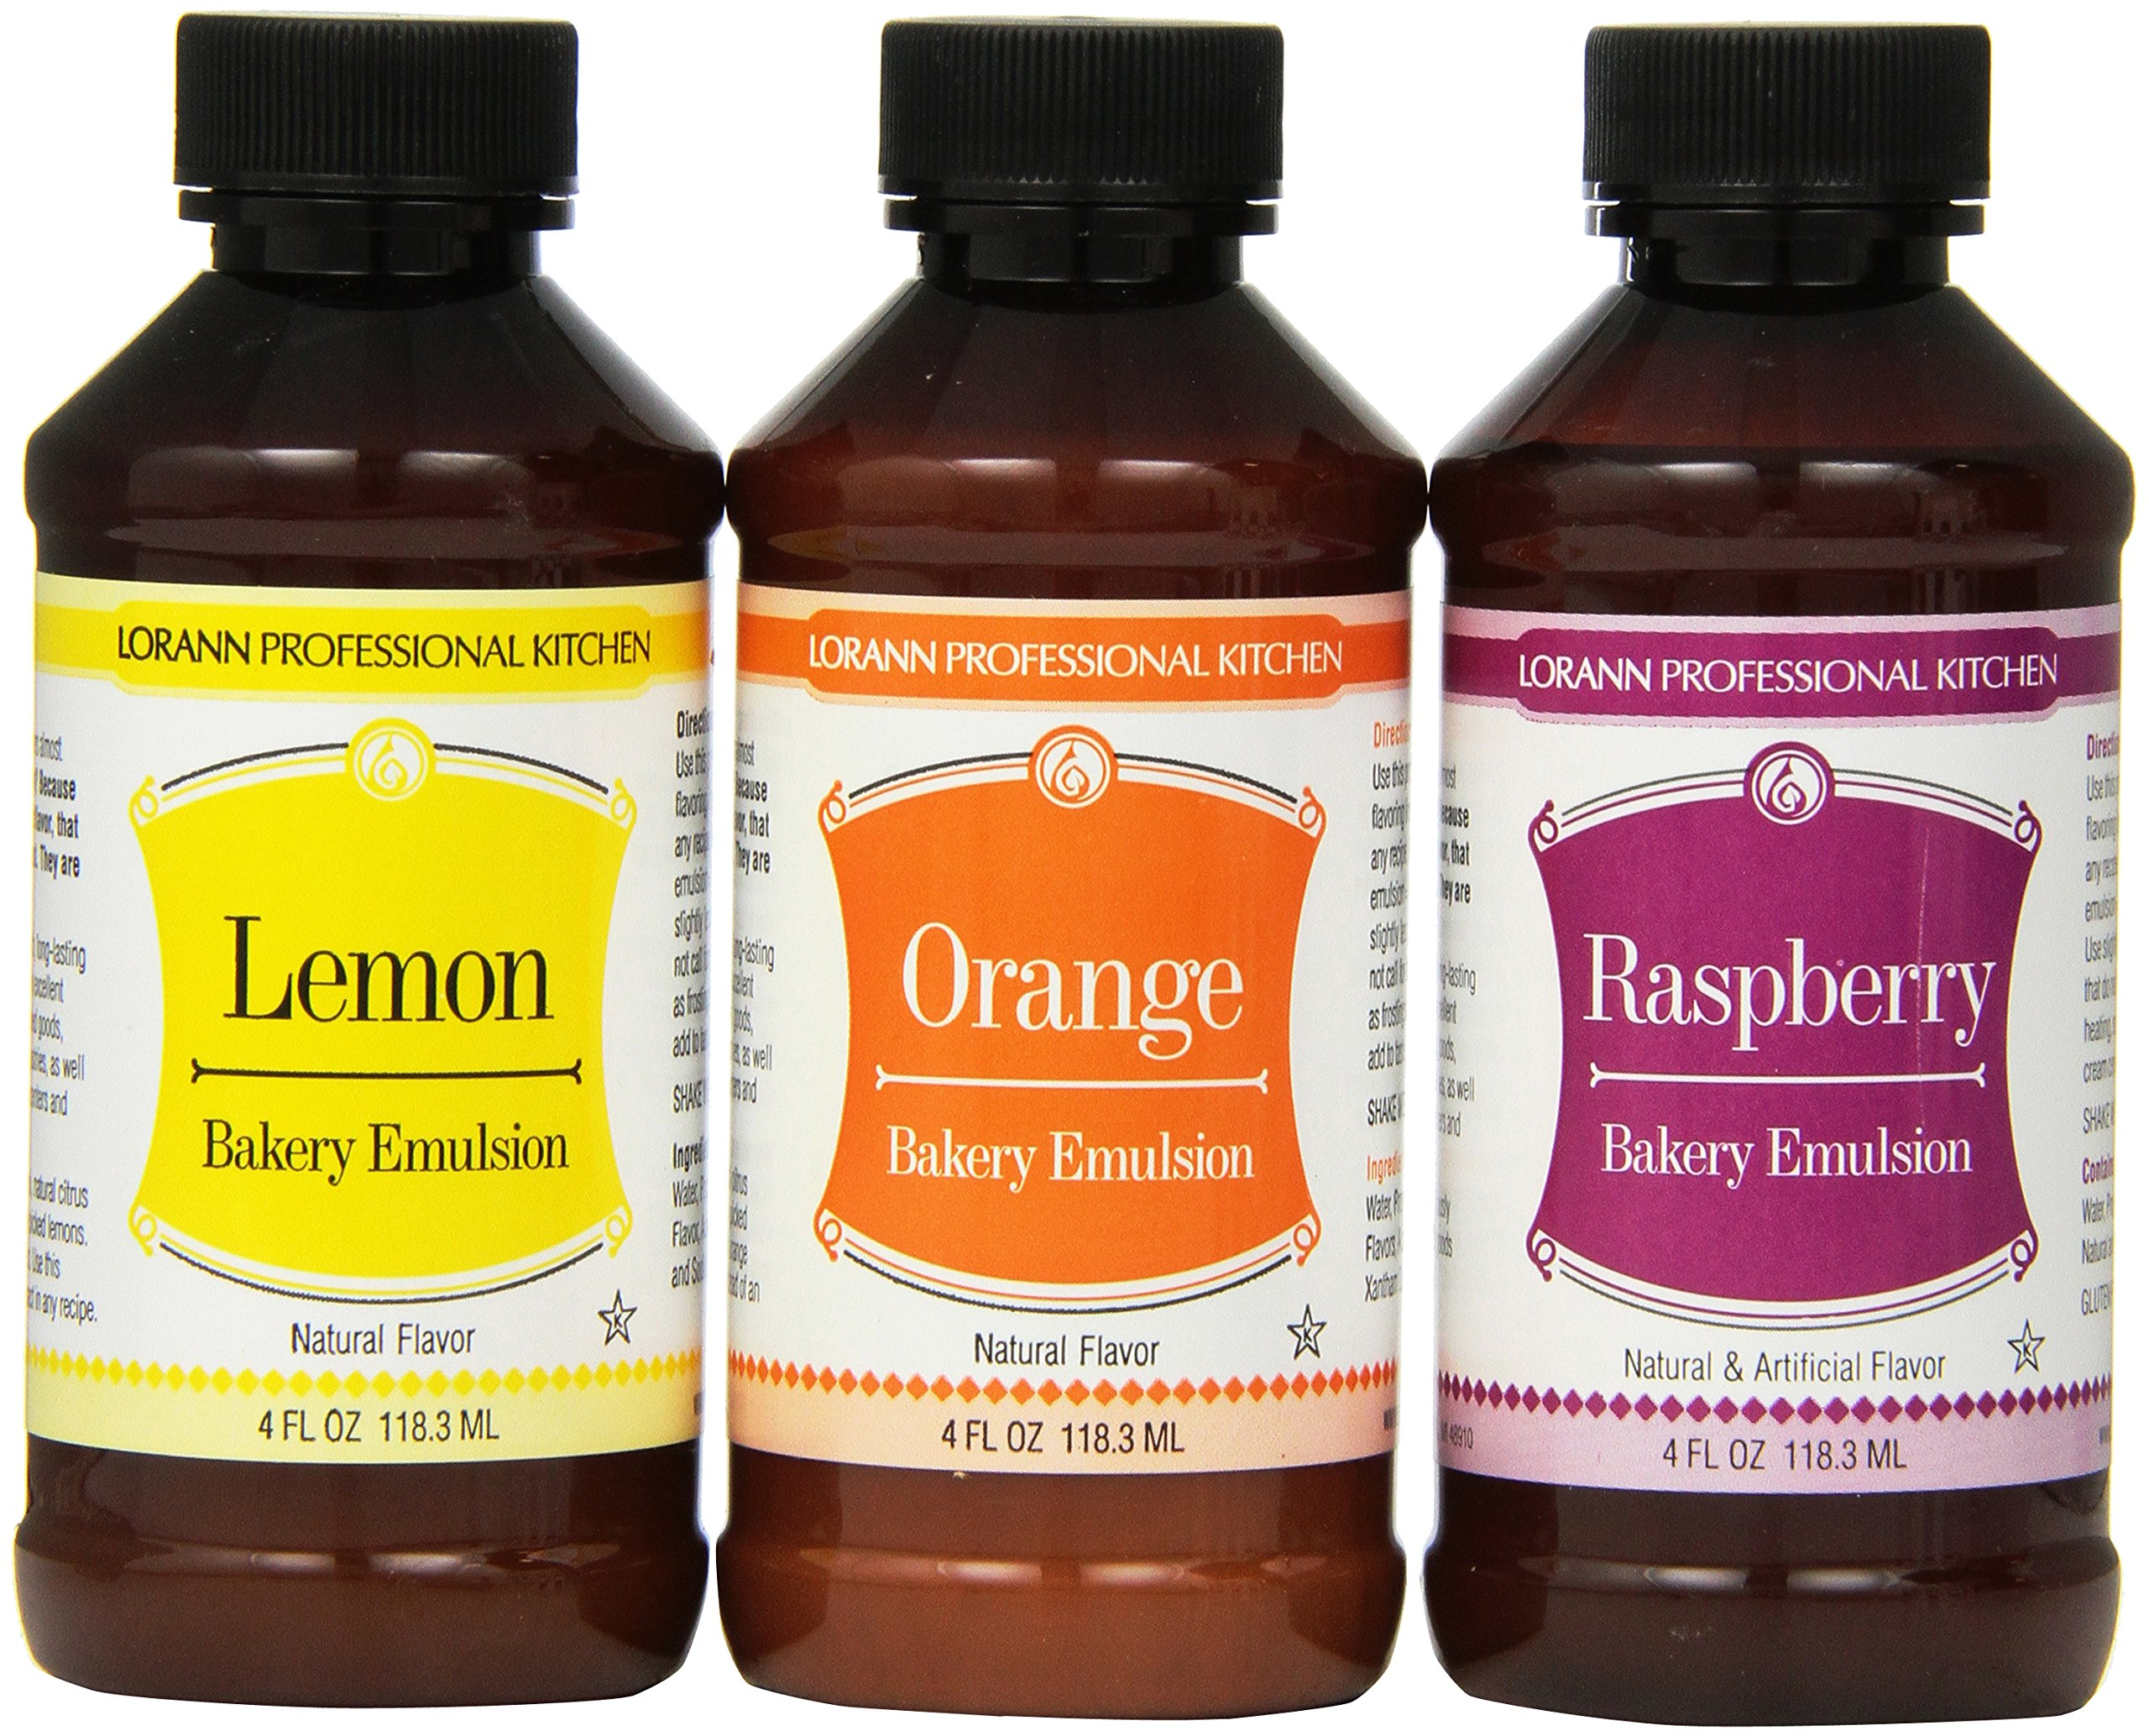 Lorann Oils Bakery Emulsion Bundle, Lemon, Orange and Raspberry, 4 Fluid Ounce